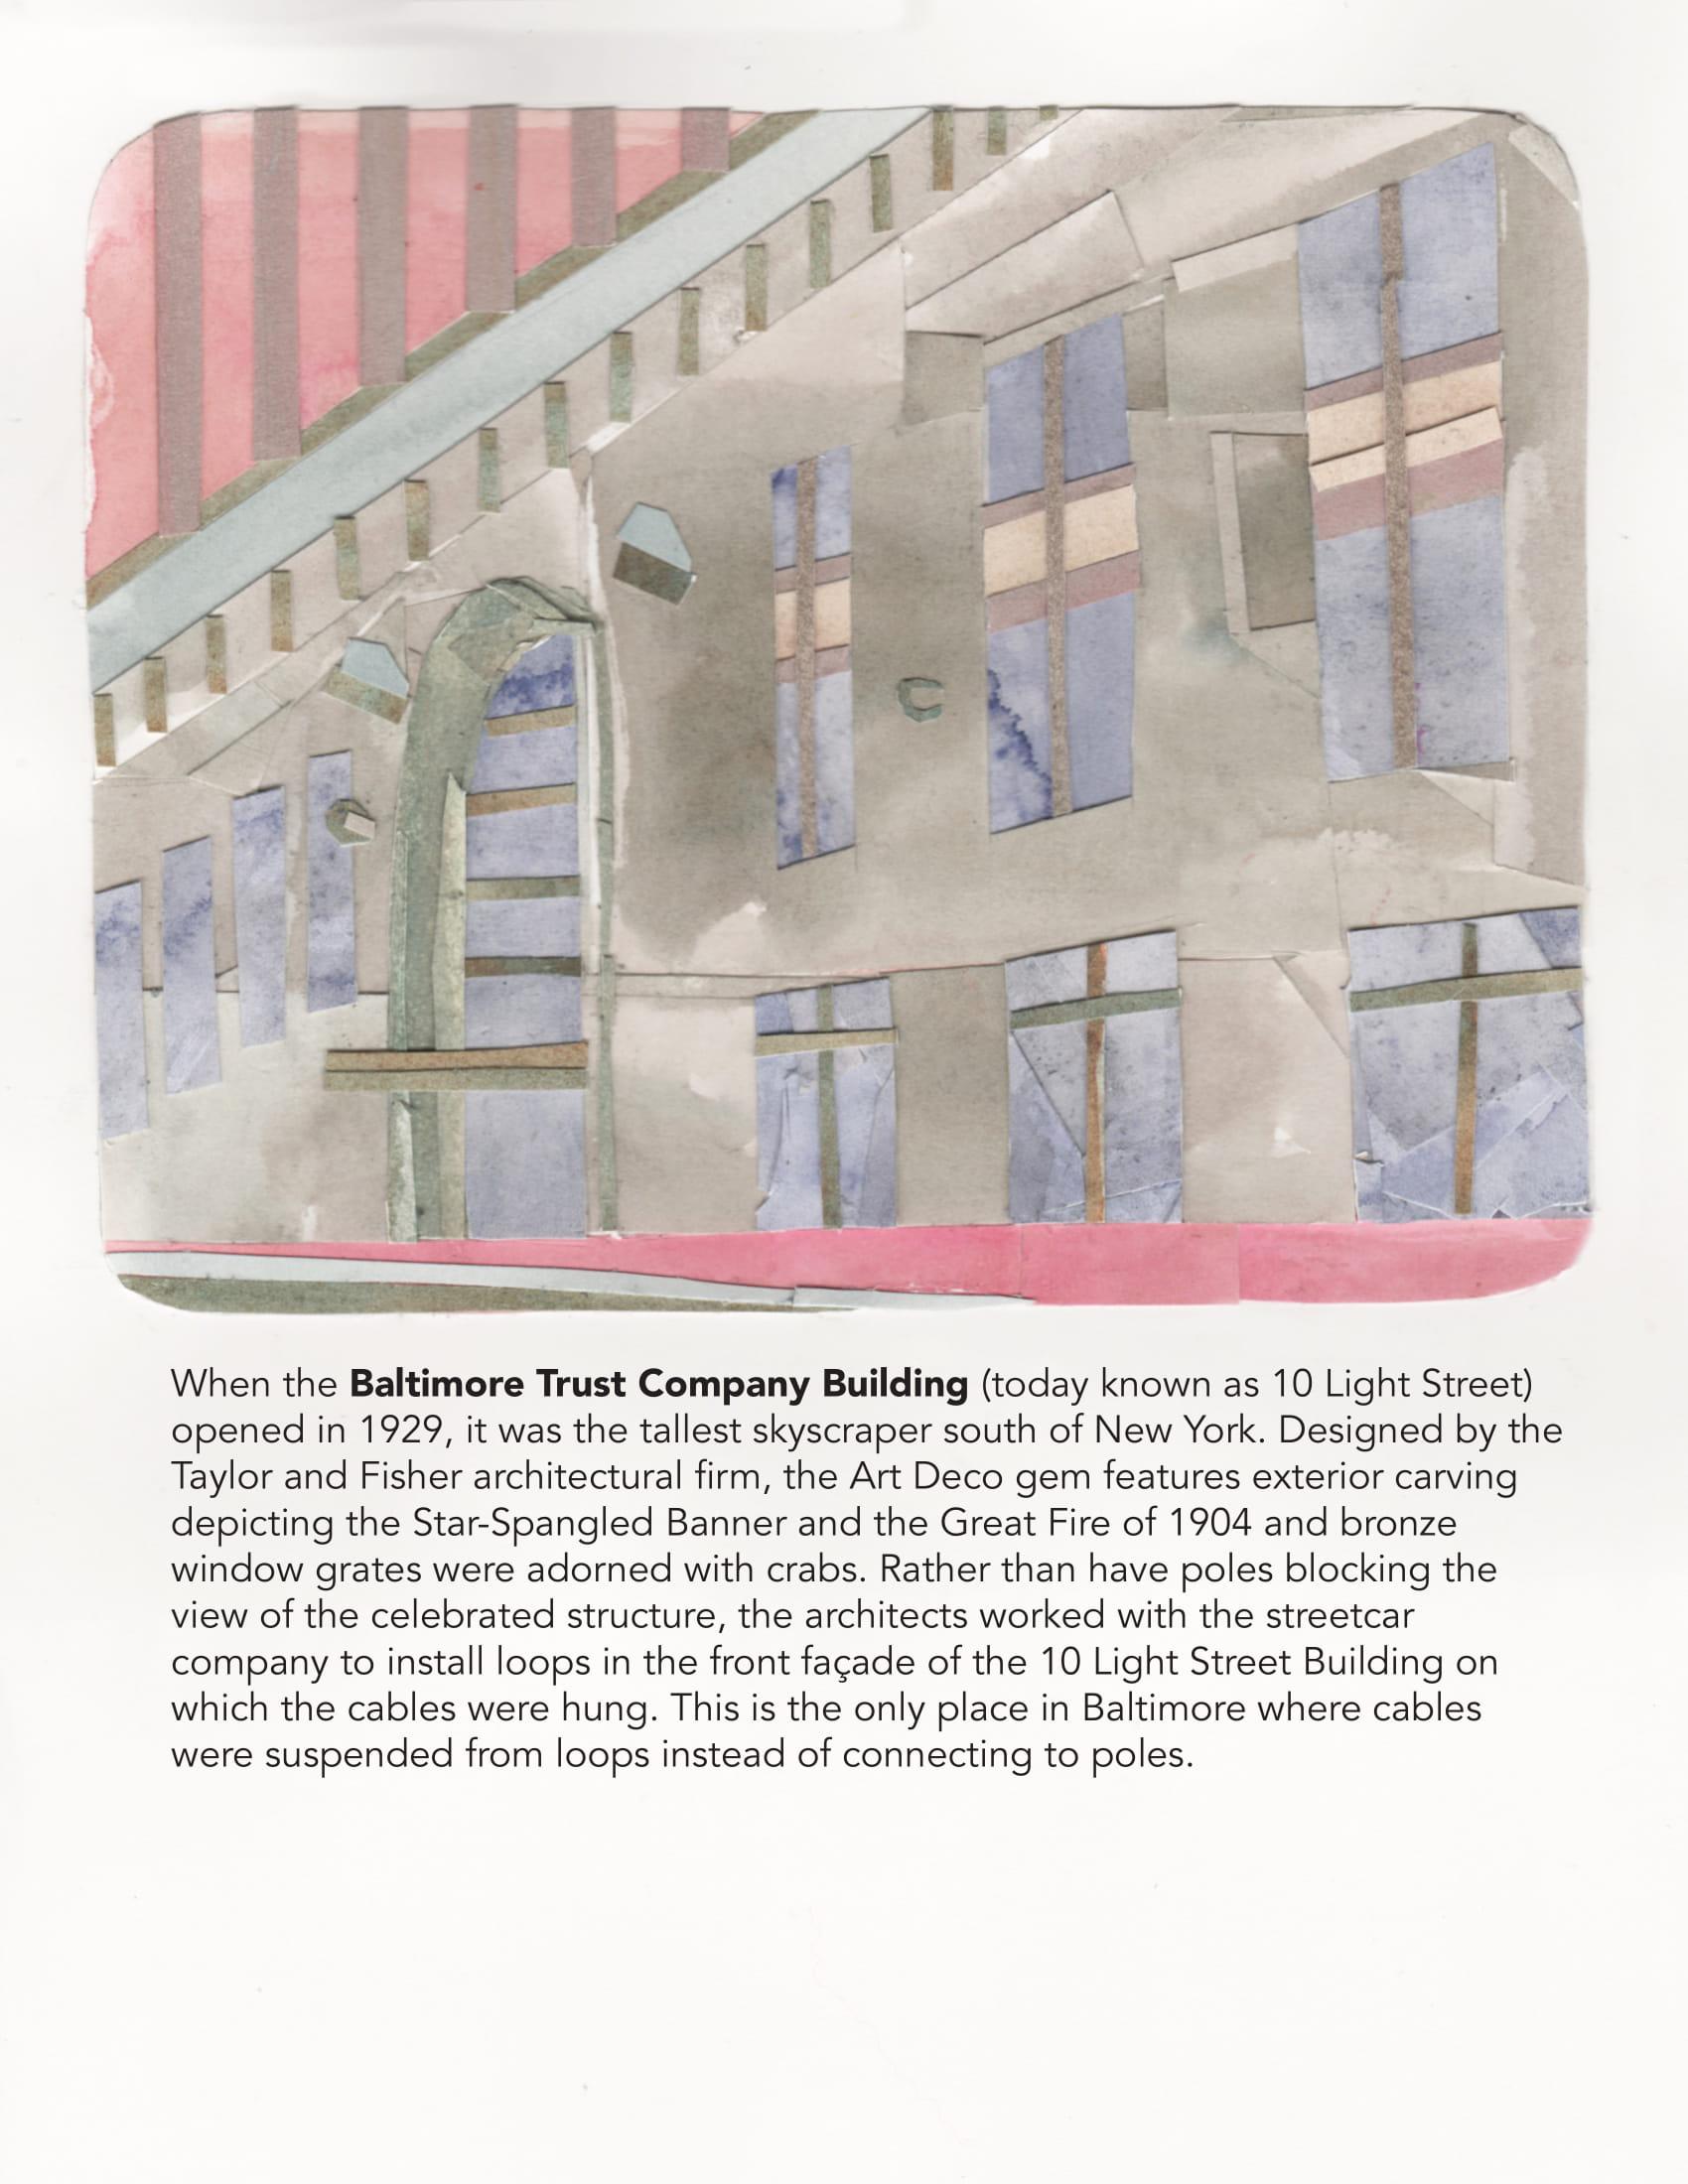 7. Baltimore Trust Company Building.jpg